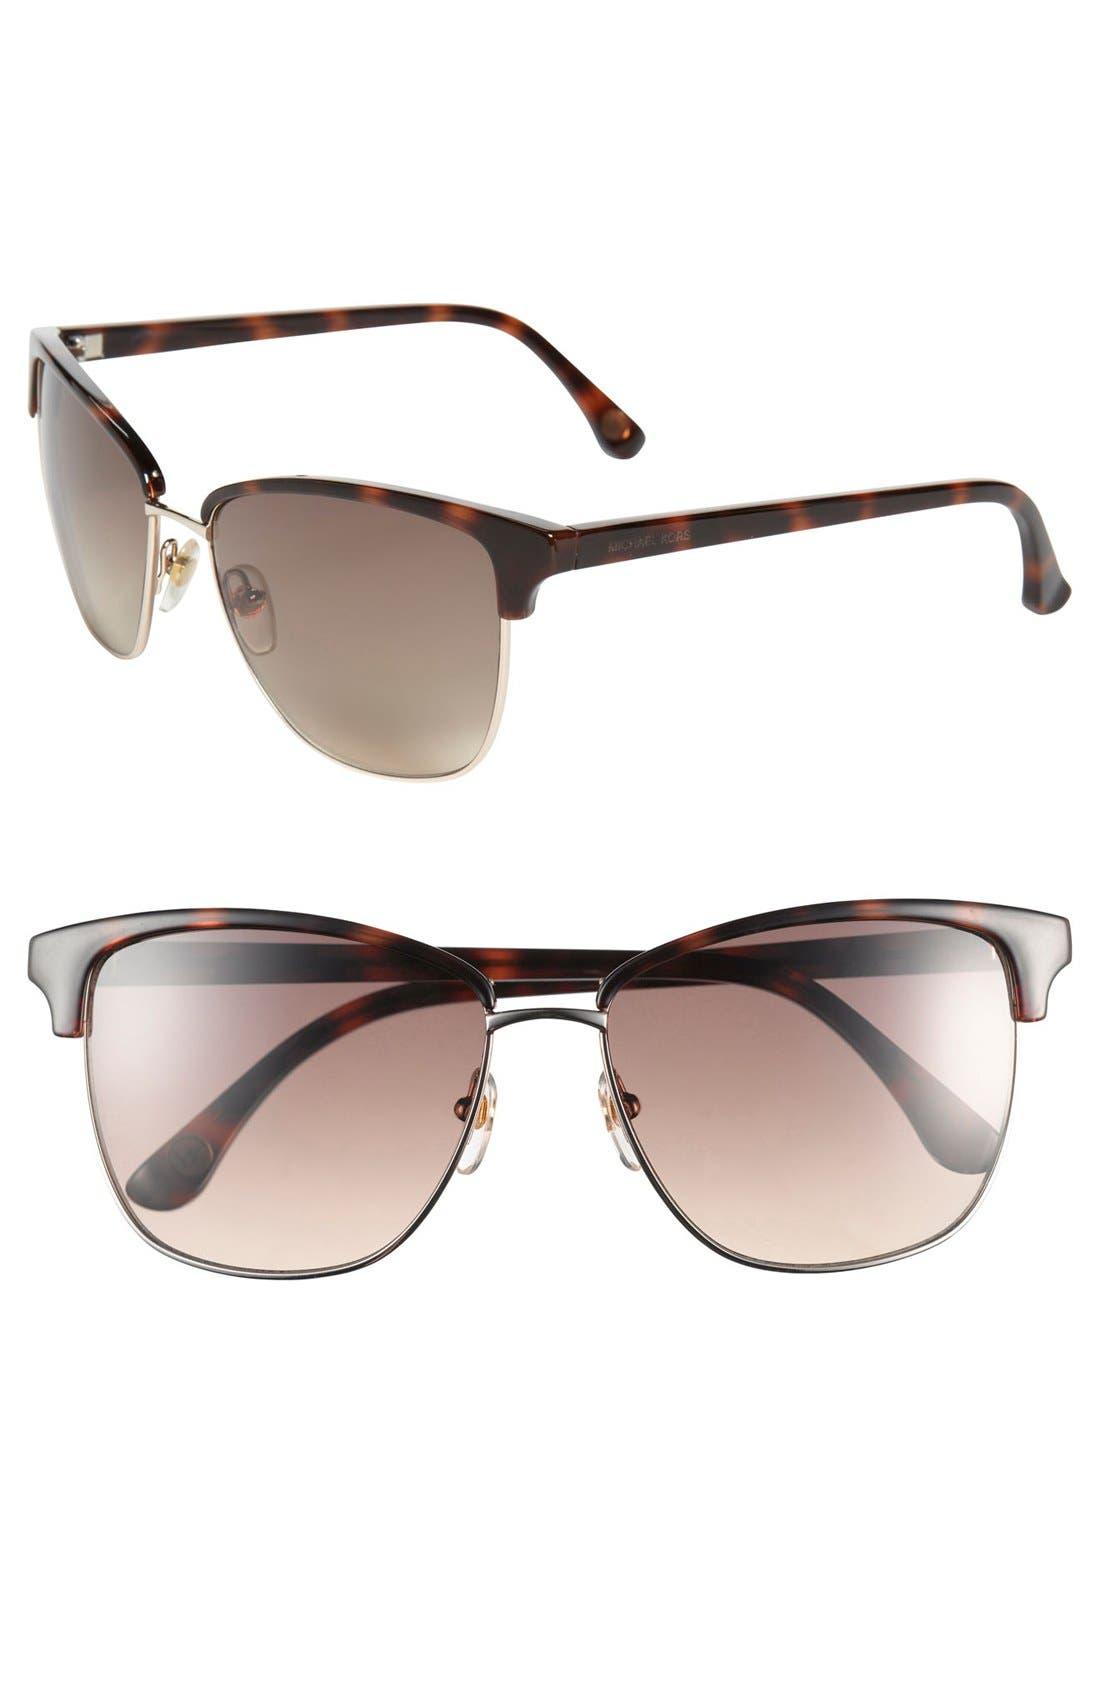 Alternate Image 1 Selected - MICHAEL Michael Kors 'Ruth' 57mm Retro Sunglasses